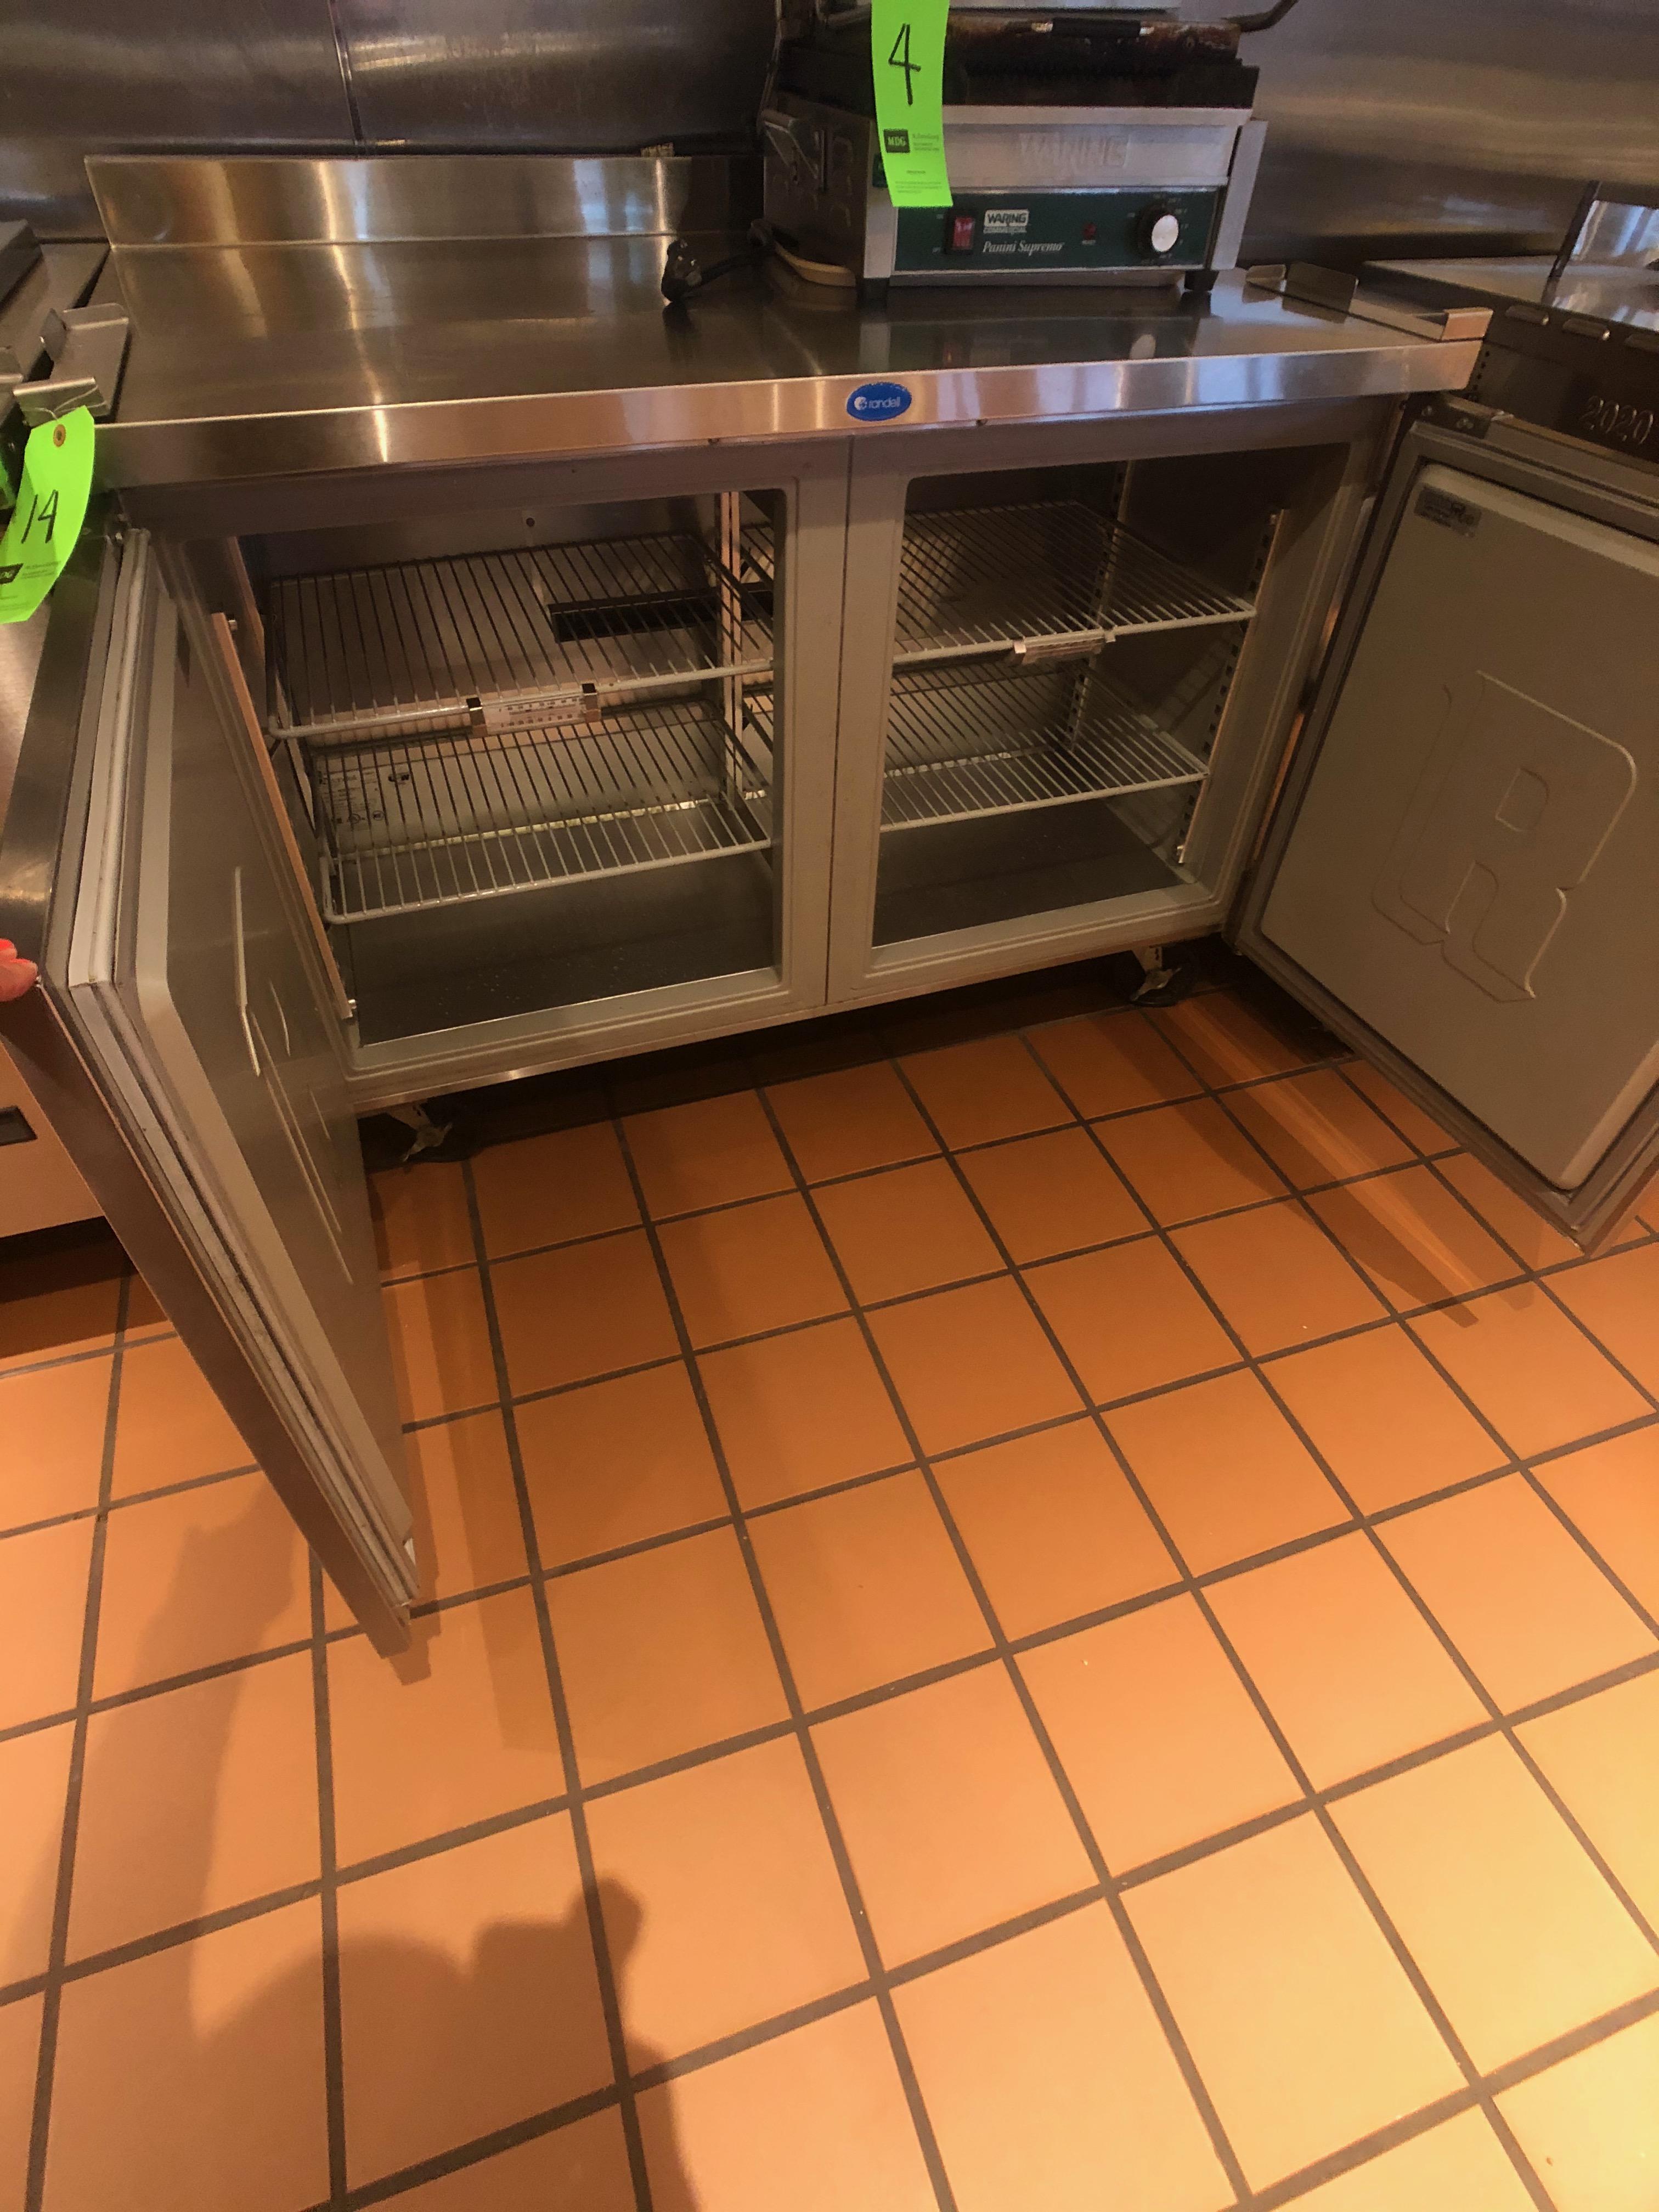 "Randell (2) Door Worktop Refrigerator, Model 9302-7, 48"" W x 30"" D x 36"" H, Mounted on Casters - Image 2 of 4"